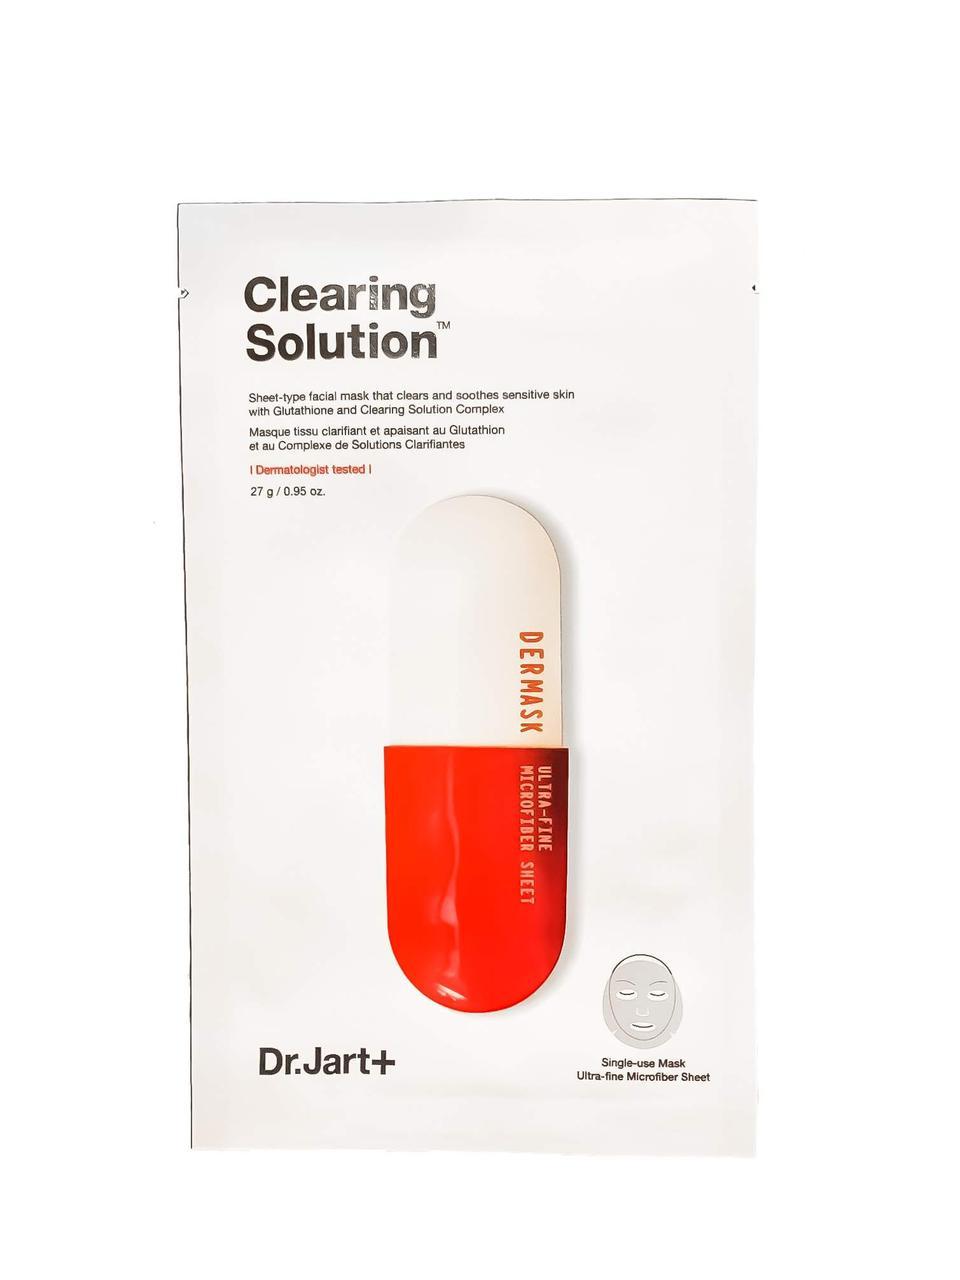 Очищаюча тканинна маска з ефектом апаратного очищення Dr.Jart + The Mask Micro Jet Clearing Solution